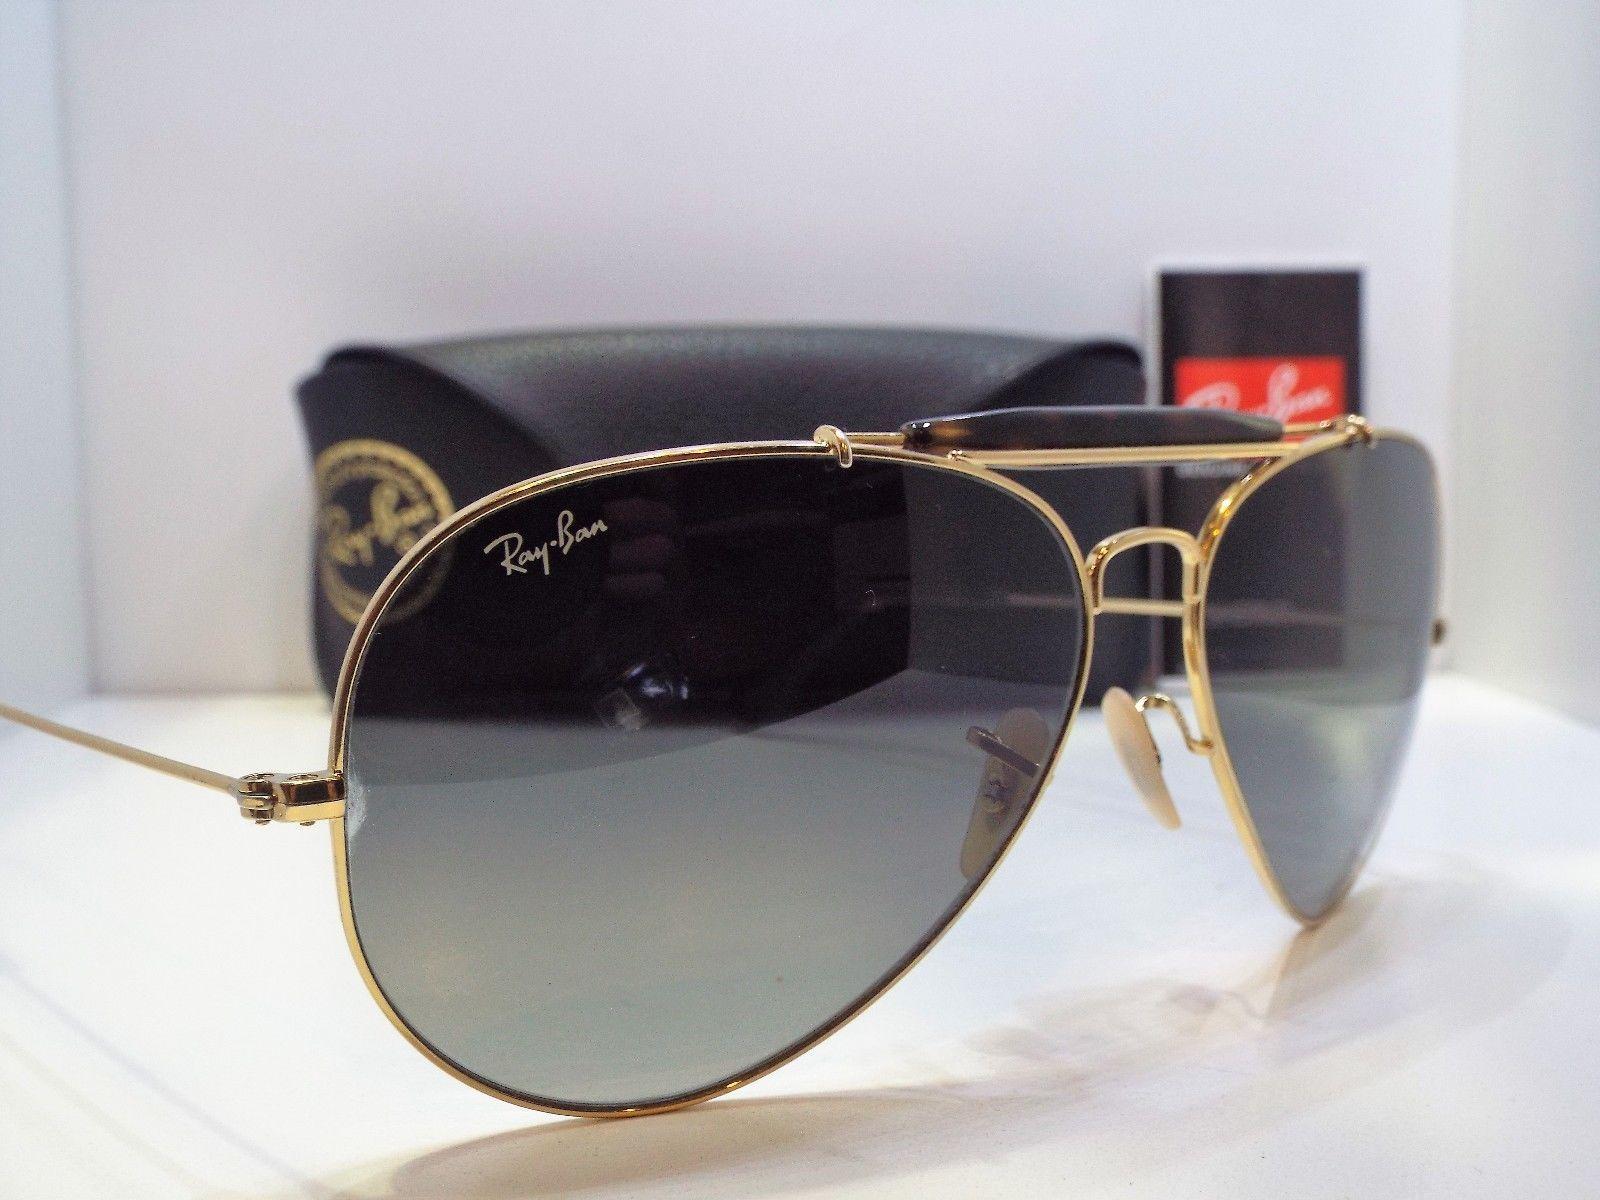 8974e7b0f Authentic Ray-Ban RB 3029 181/71 Gold Havana Grey Outdoorsman II Sunglasses  $220